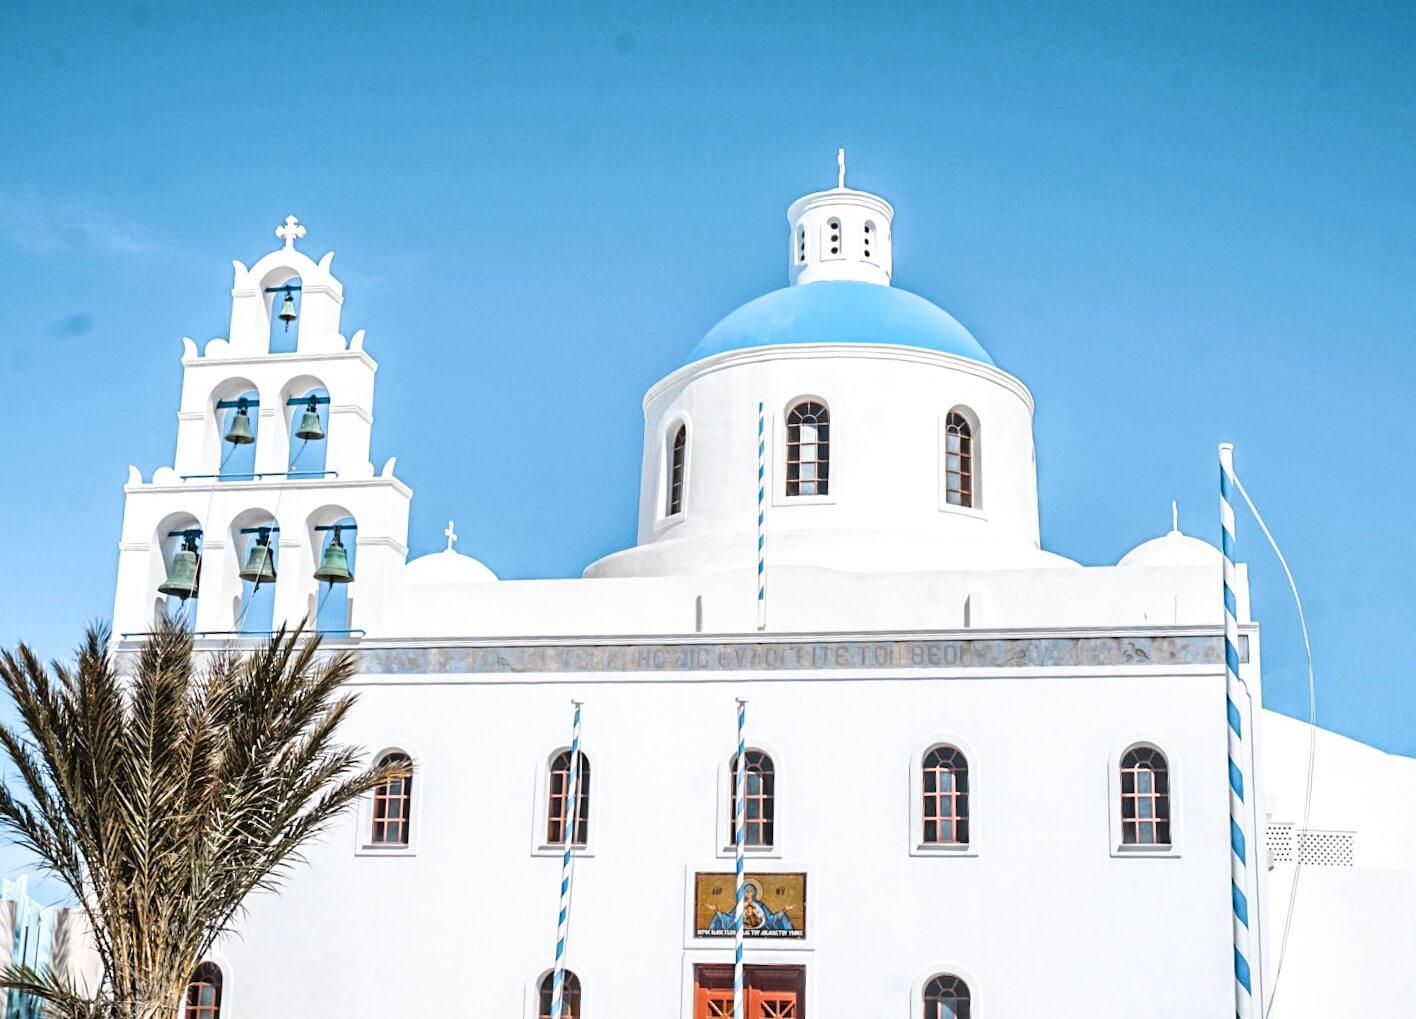 maison blanche toit bleu santorin